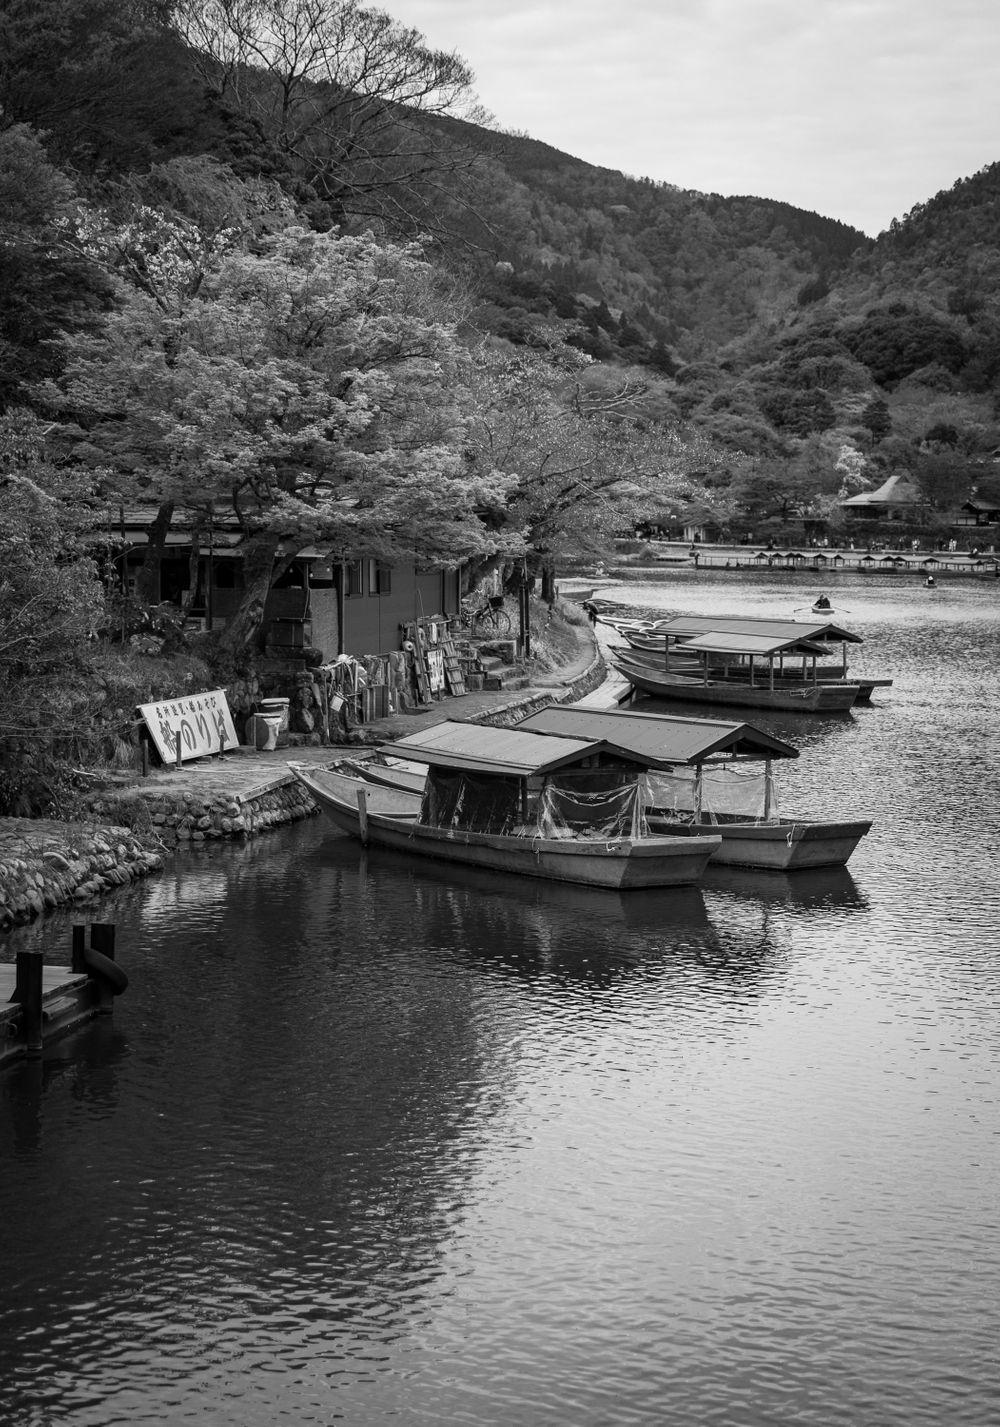 180401_NM_Japan_1502.JPG